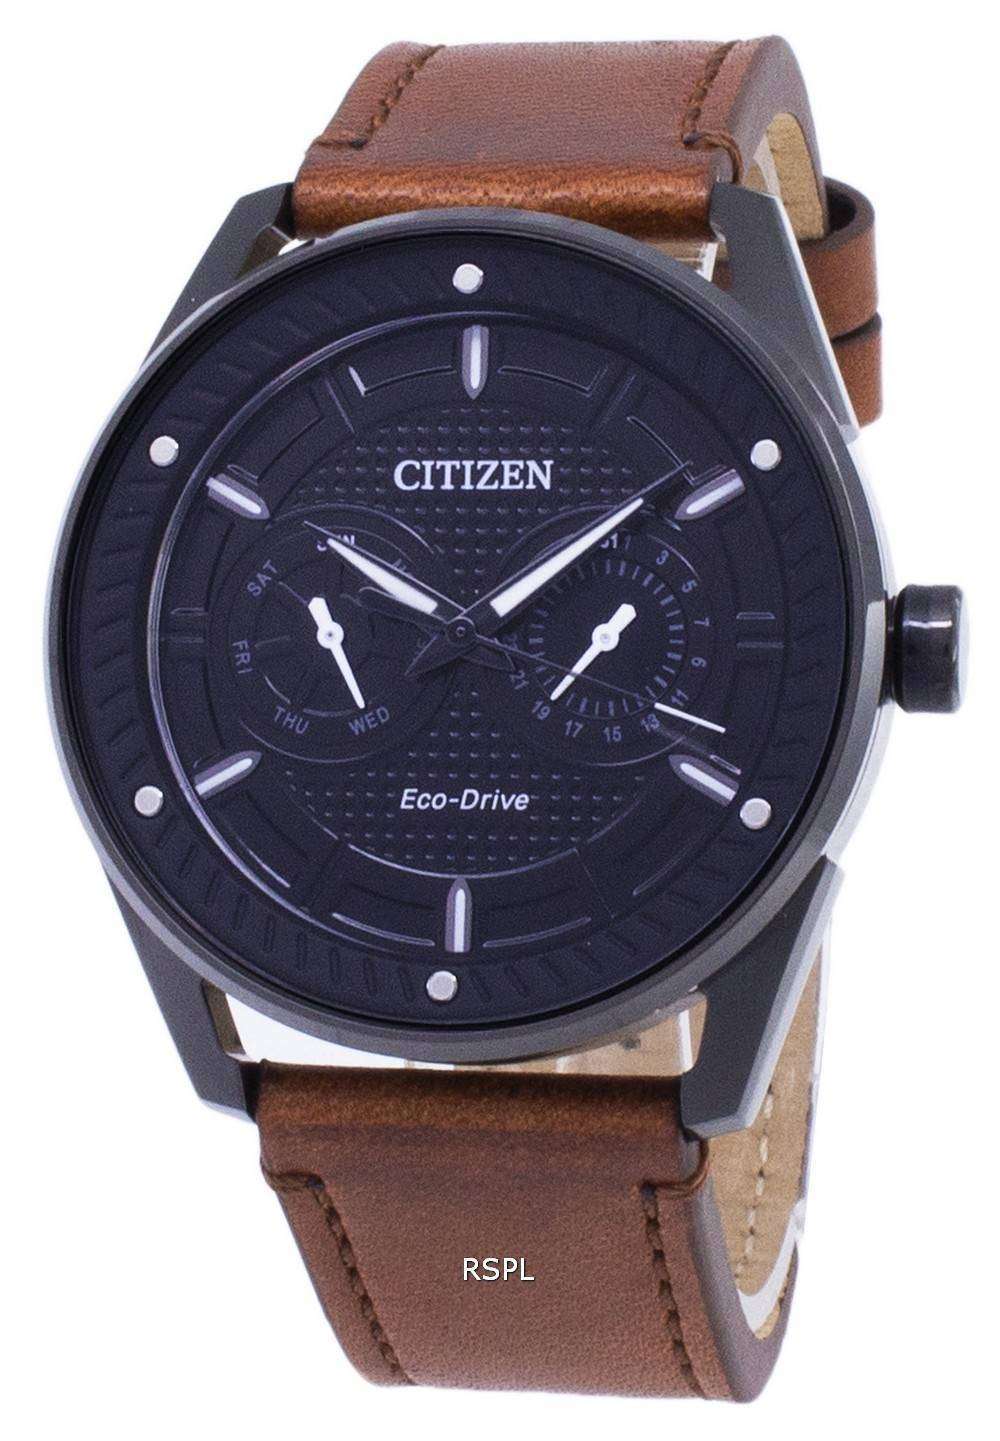 86c286a48 Citizen Eco-Drive BU4028-18E Power Reserve Analog Men's Watch ...